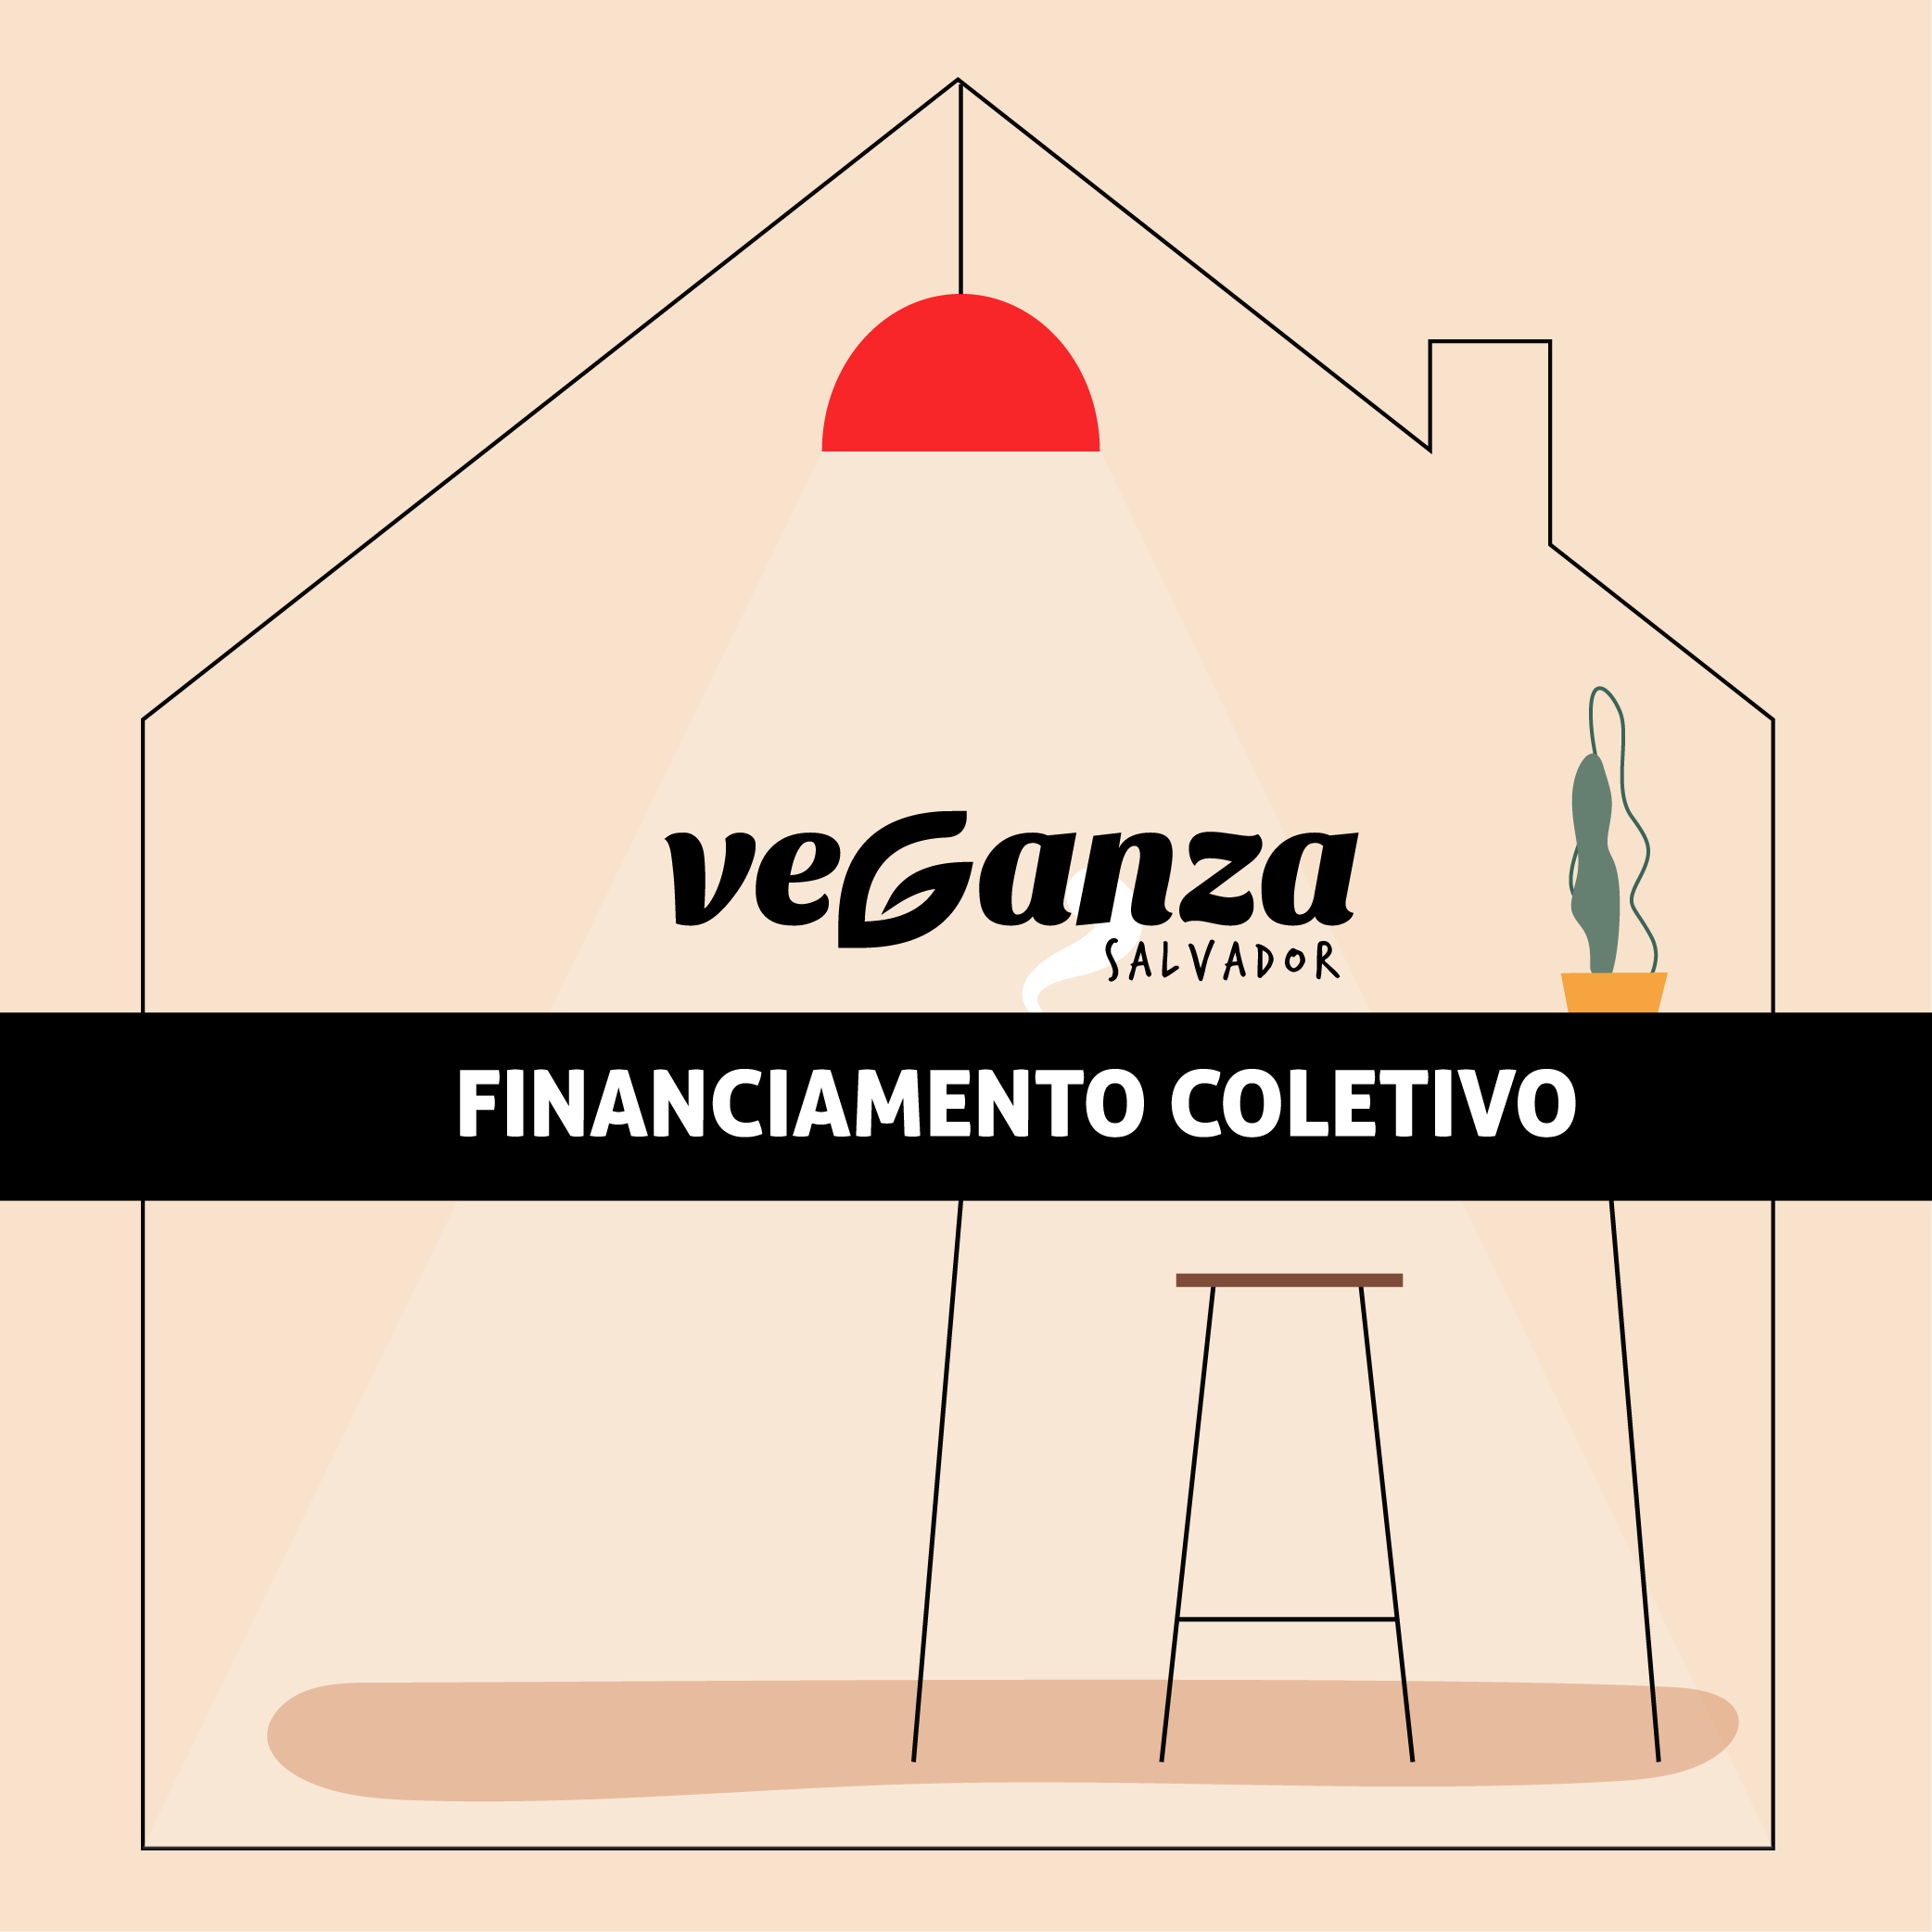 Veganza 01